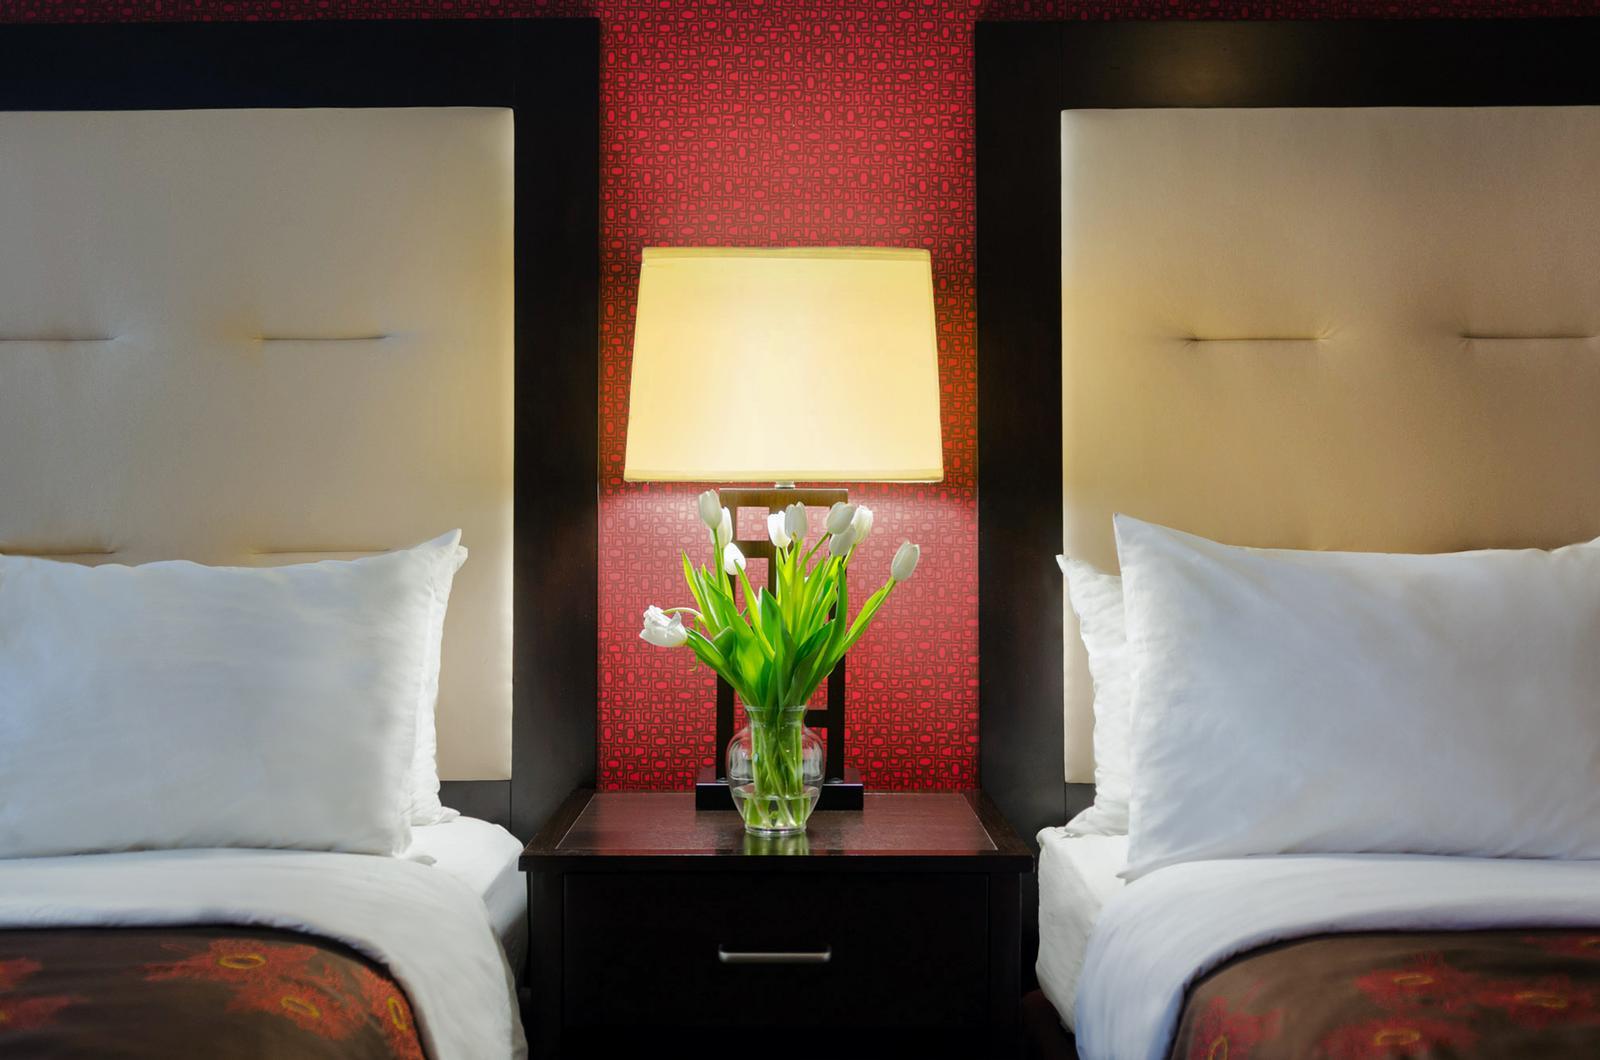 hotel zero degrees, blog, articles, hotels